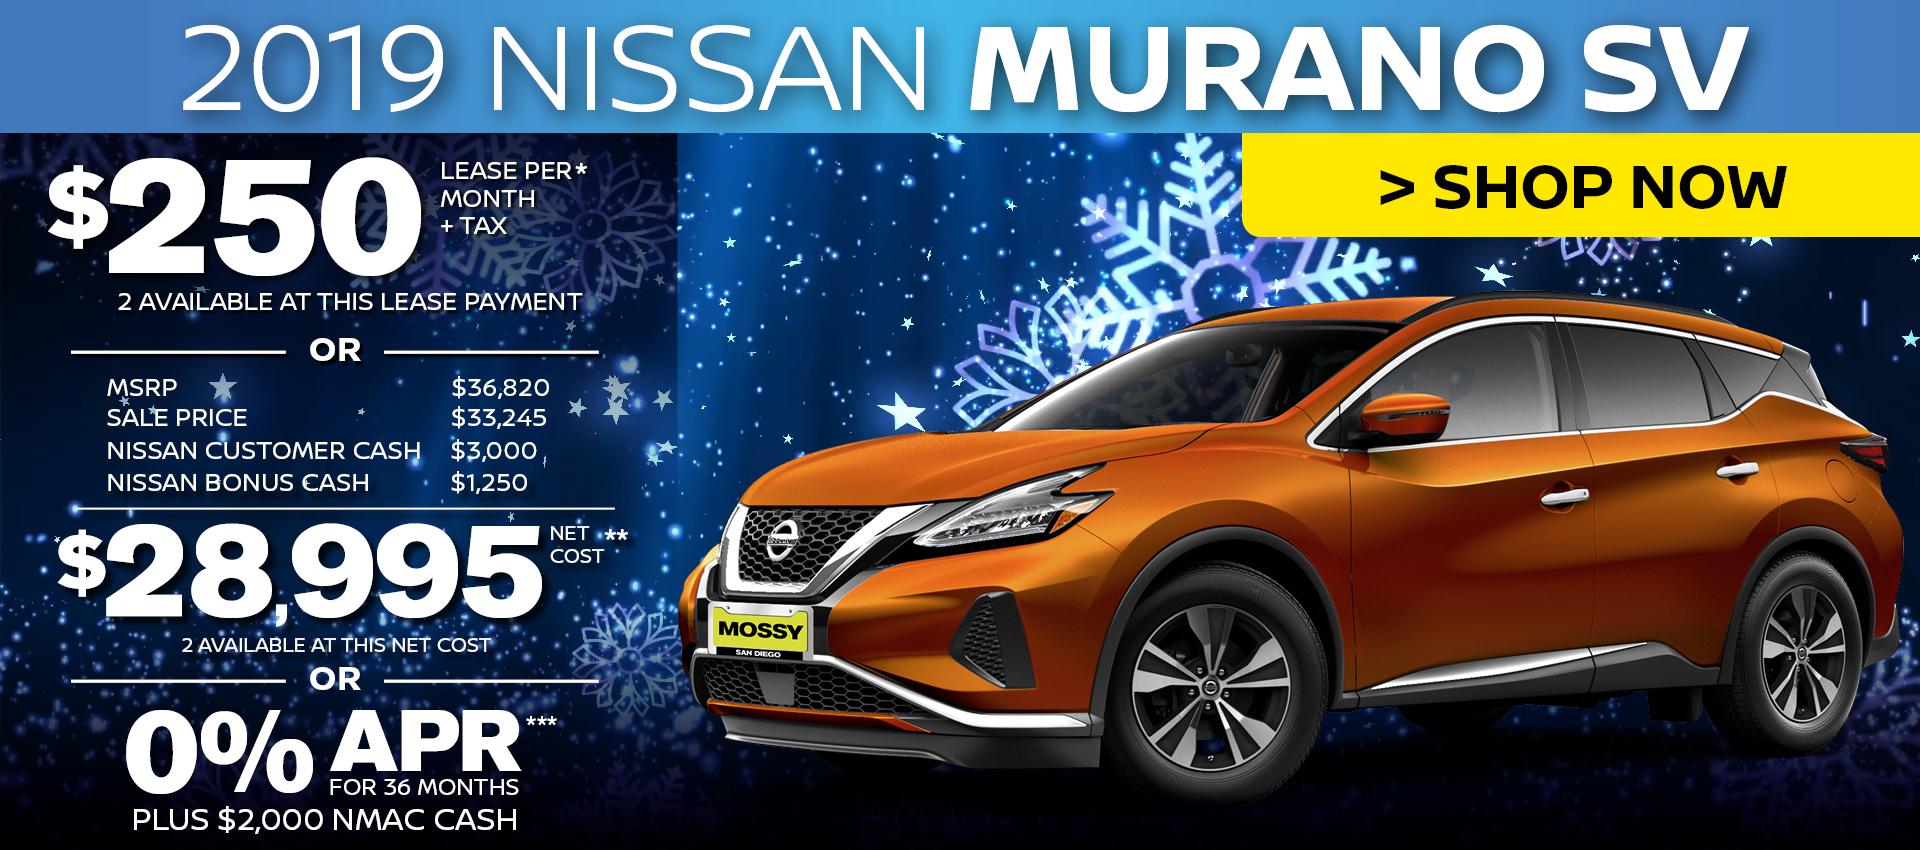 Mossy Nissan - Nissan Murano SV Purchase HP